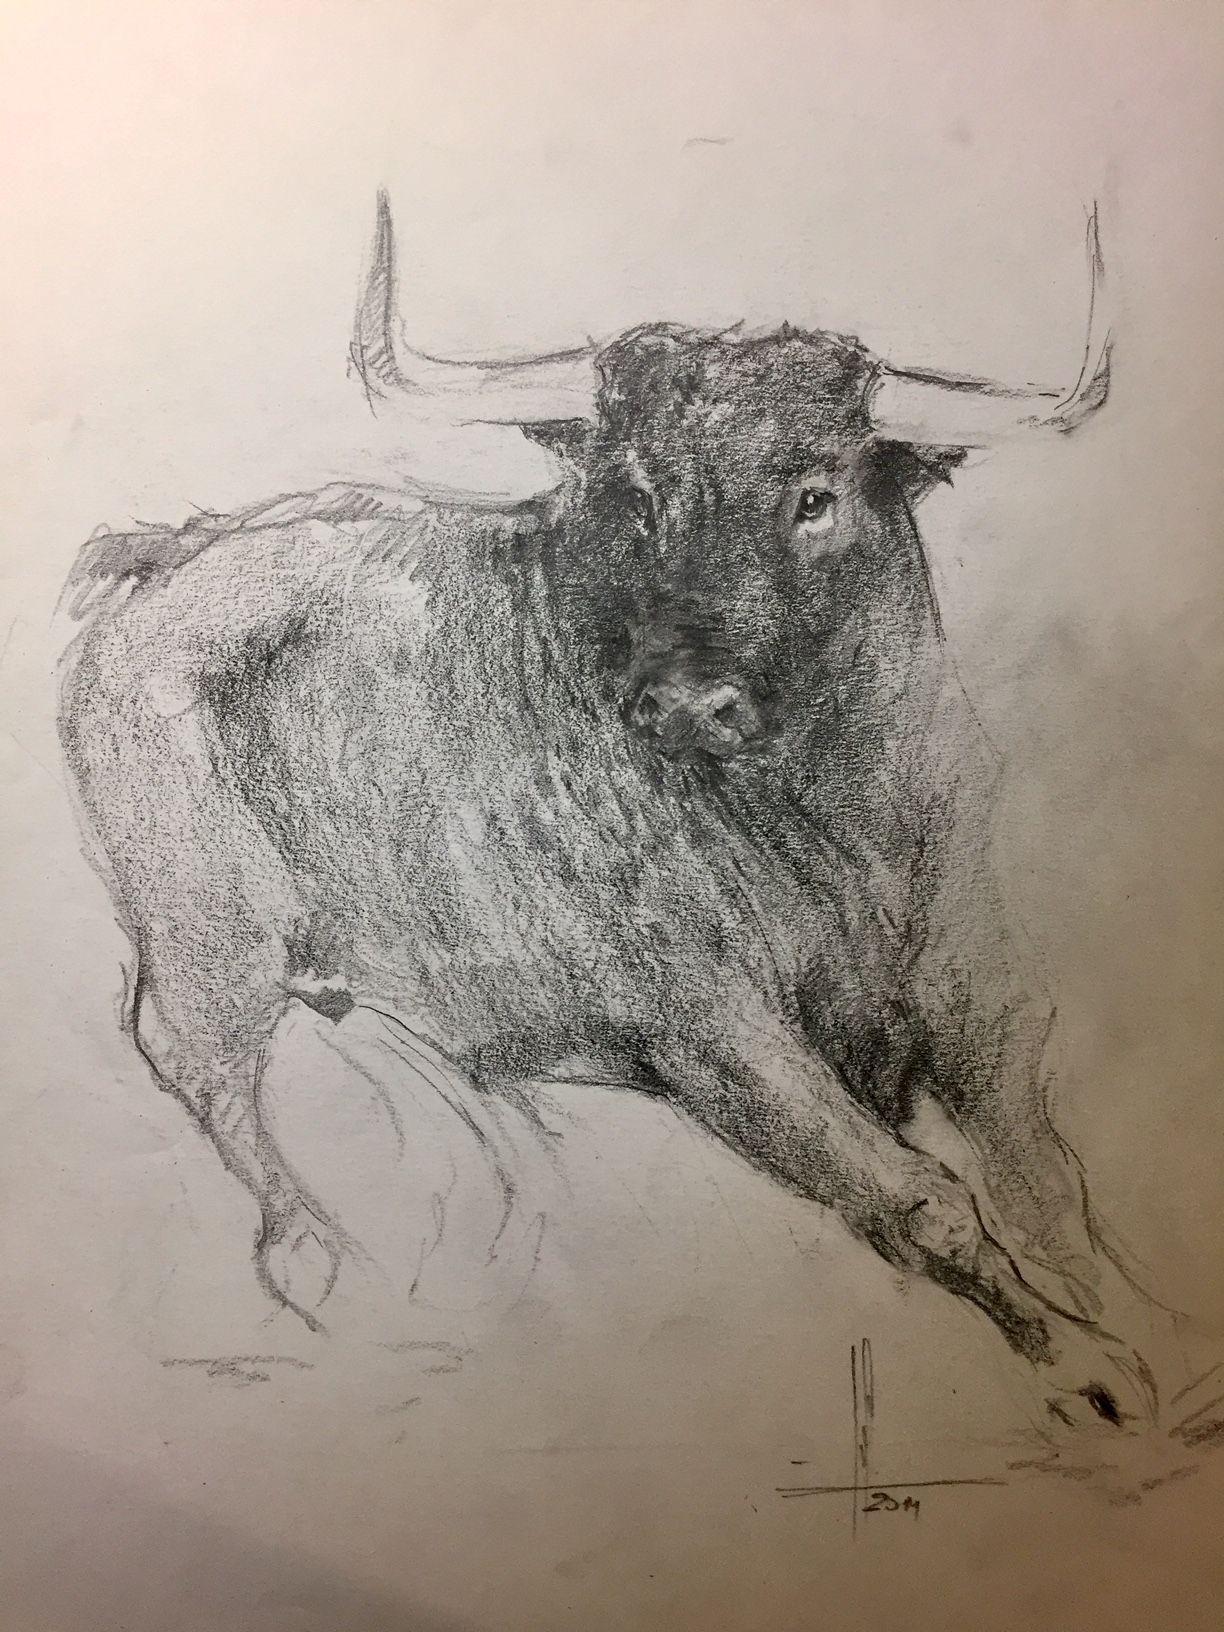 Dibujo Toro Bravo A Lápiz Por Francisco Javier Abellán Dibujos Y